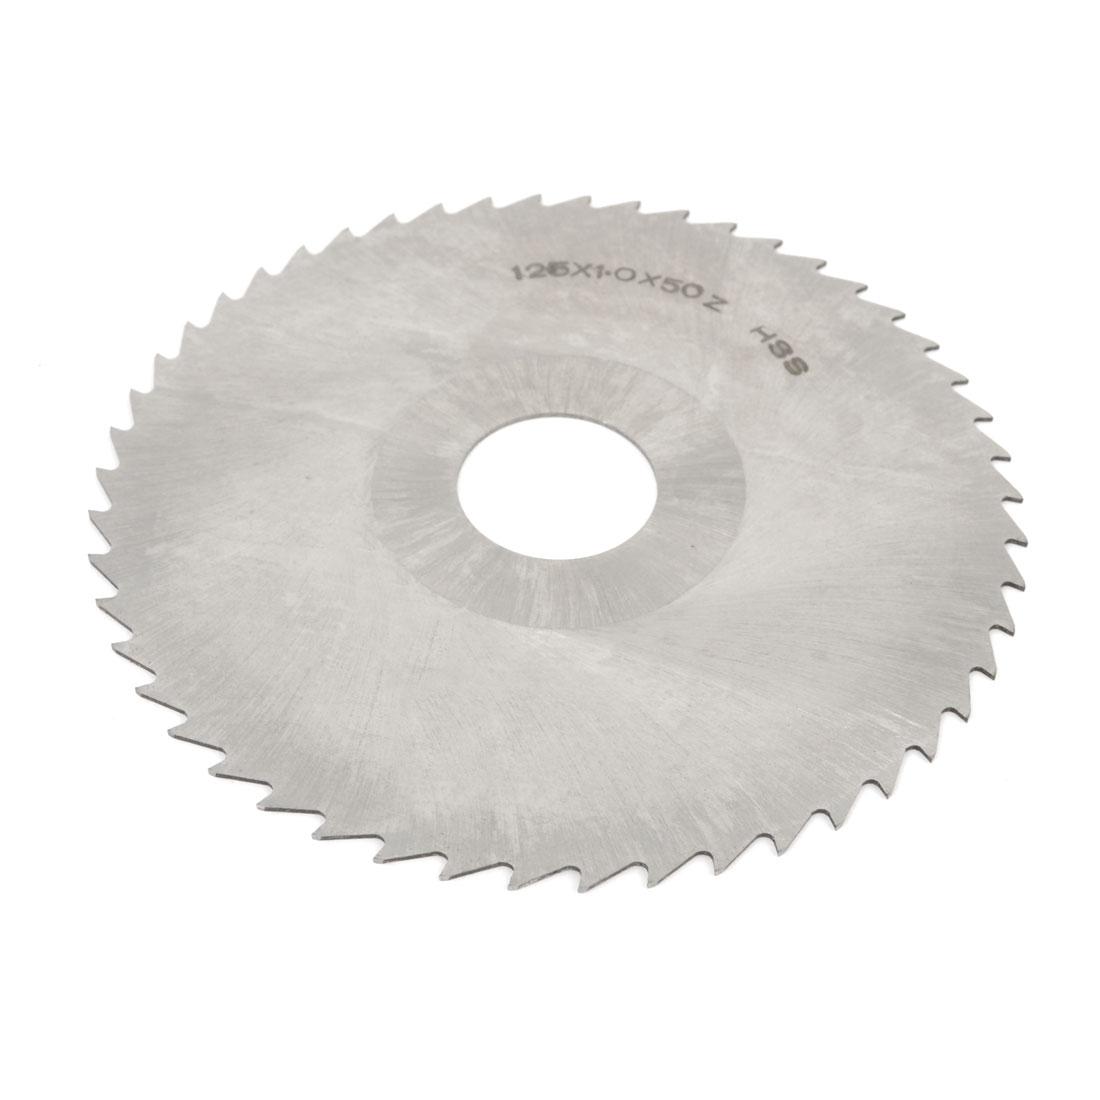 HSS 50 Teeth Circle Milling Cutter Slitting Saw 125mmx27mmx1.0mm